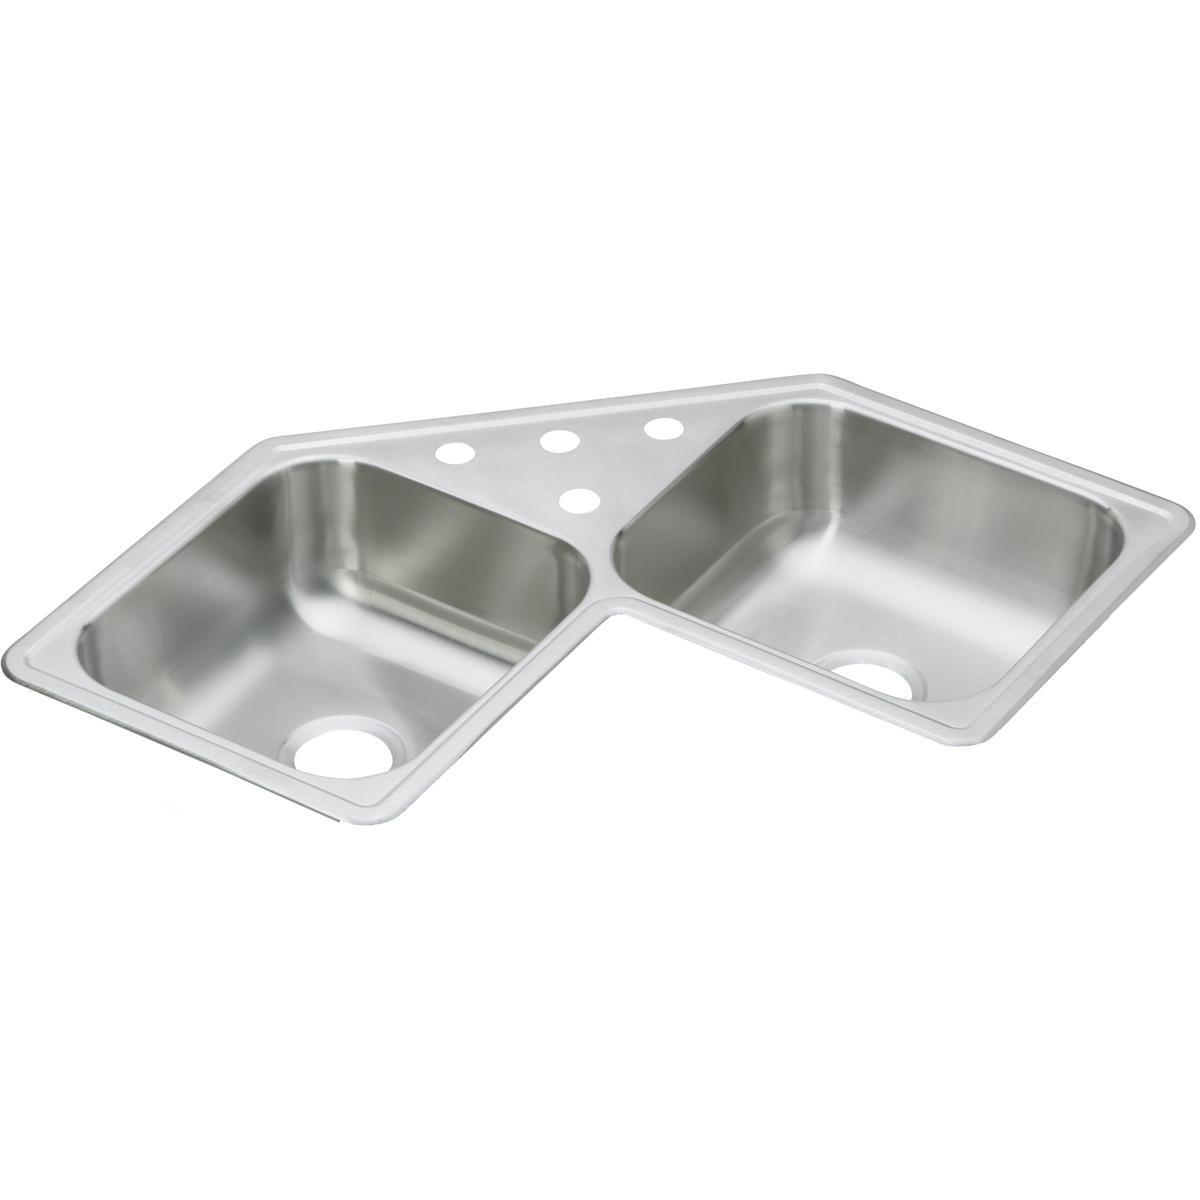 Elkay DE217323 Dayton Elite 31-7/8-Inch by 31-7/8-Inch Stainless Steel Double Bowl Three-Hole Top Mount Corner Sink, Ultra Radiant Finish